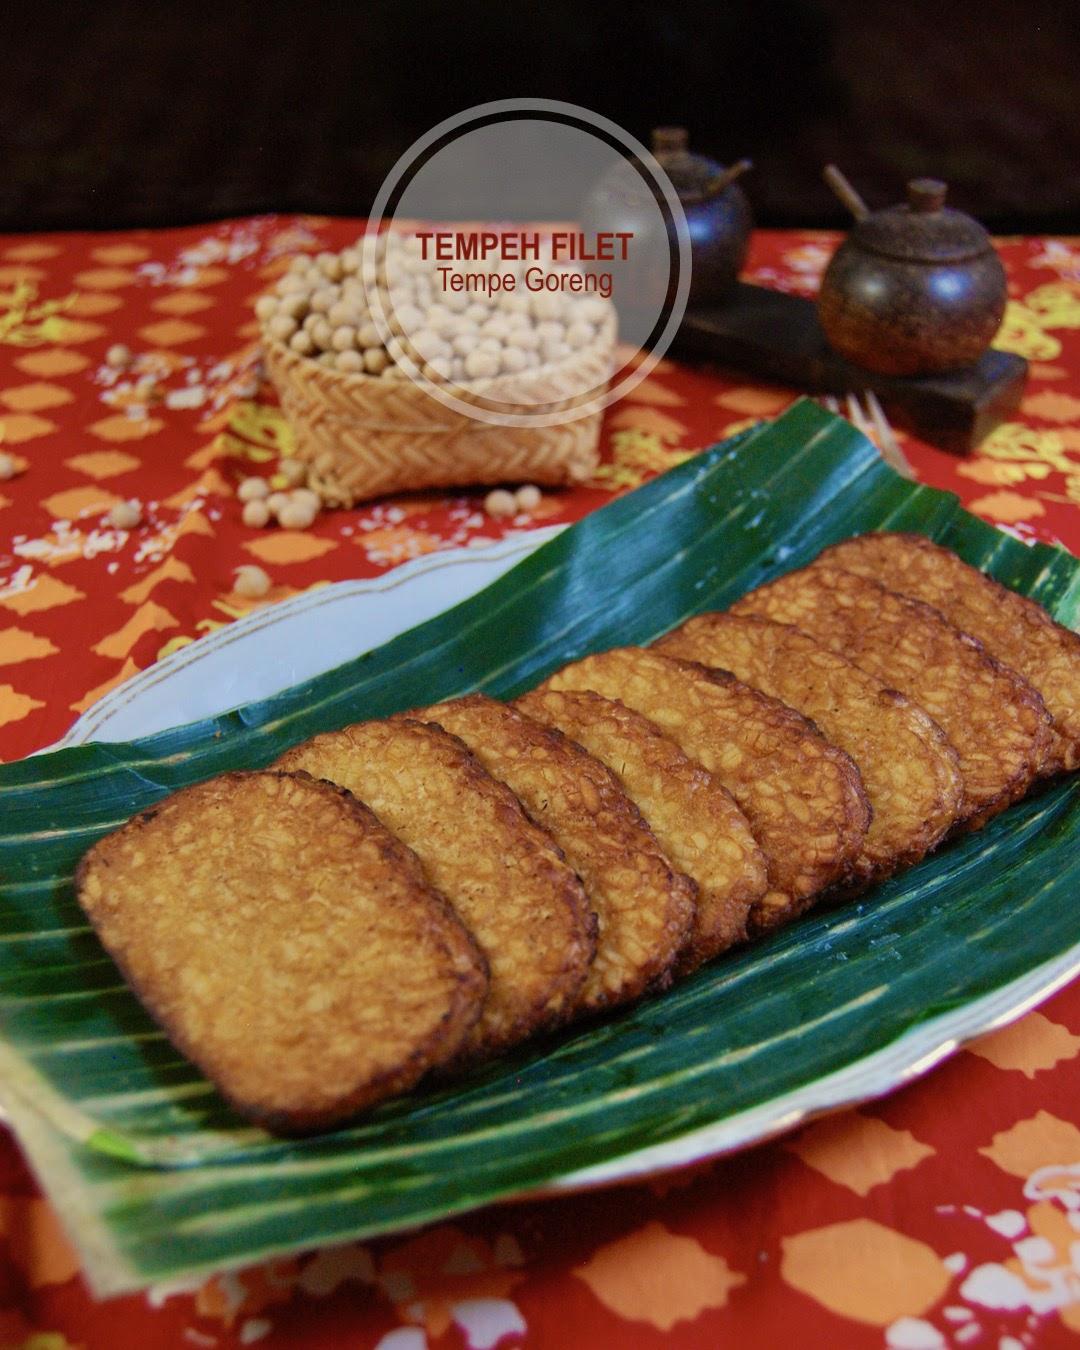 Tempeh Filet Knackig, Herzhaft und Vegan